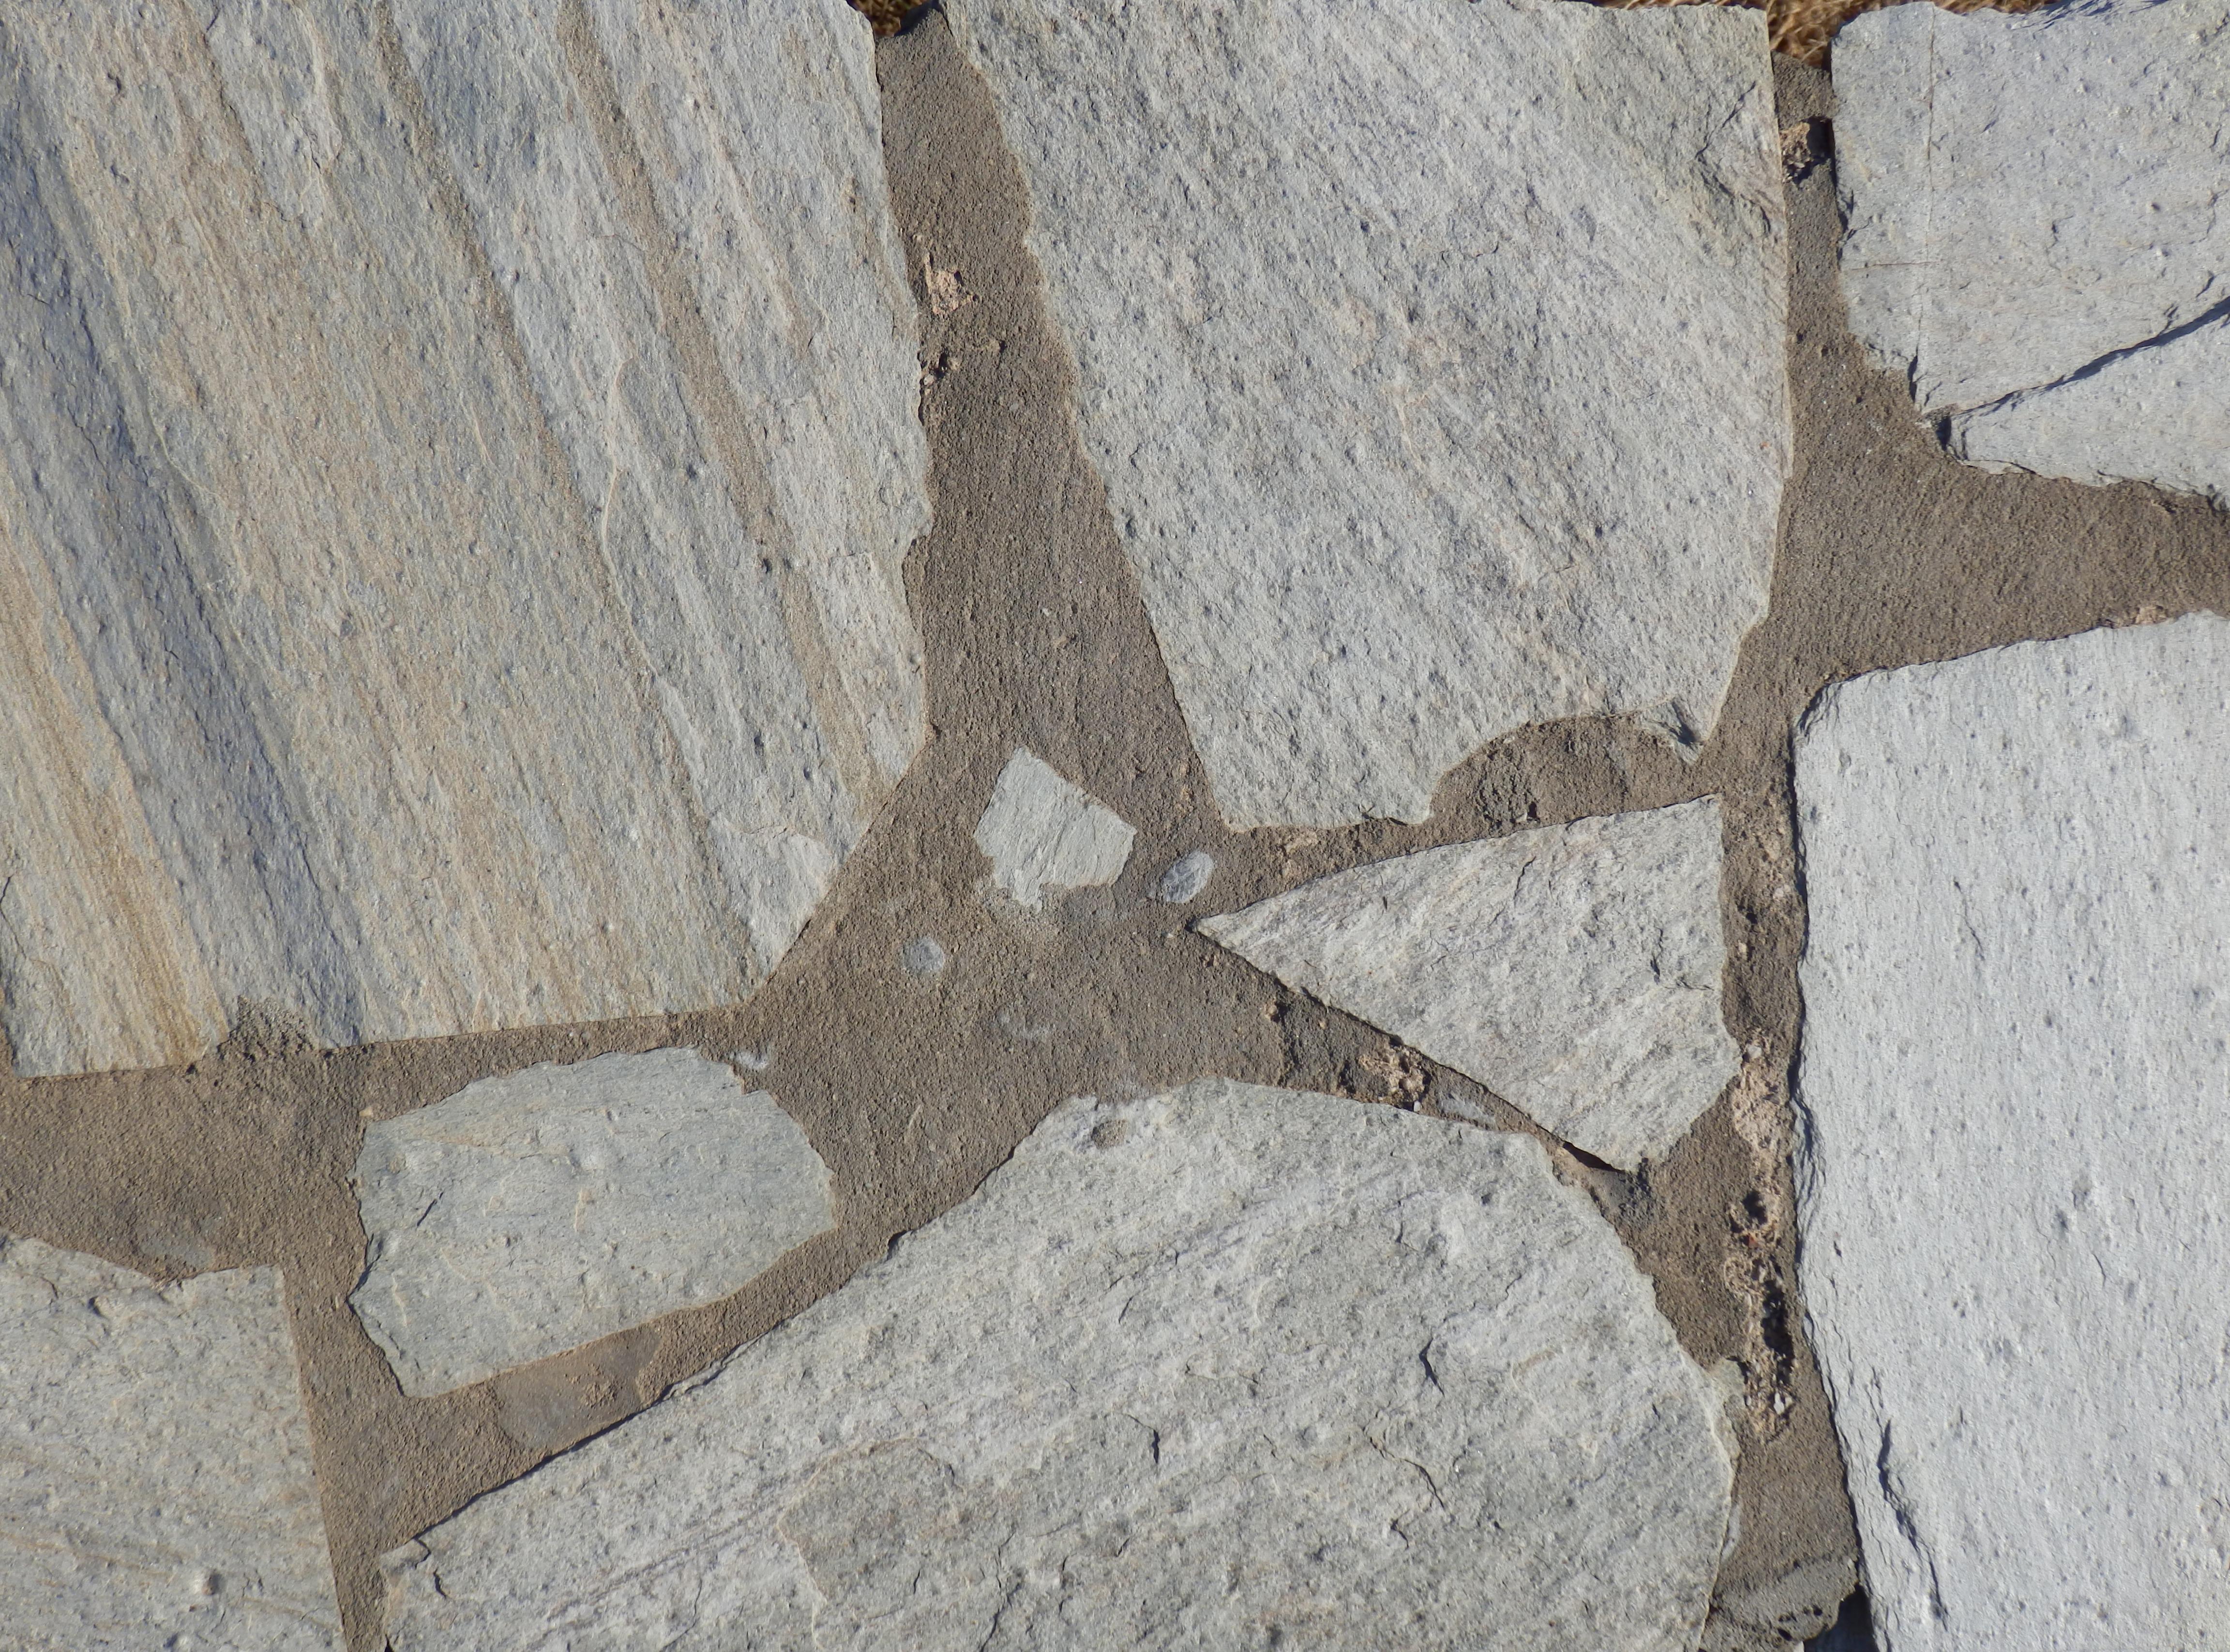 Fotos Gratis Al Aire Libre Rock Madera Textura Piso